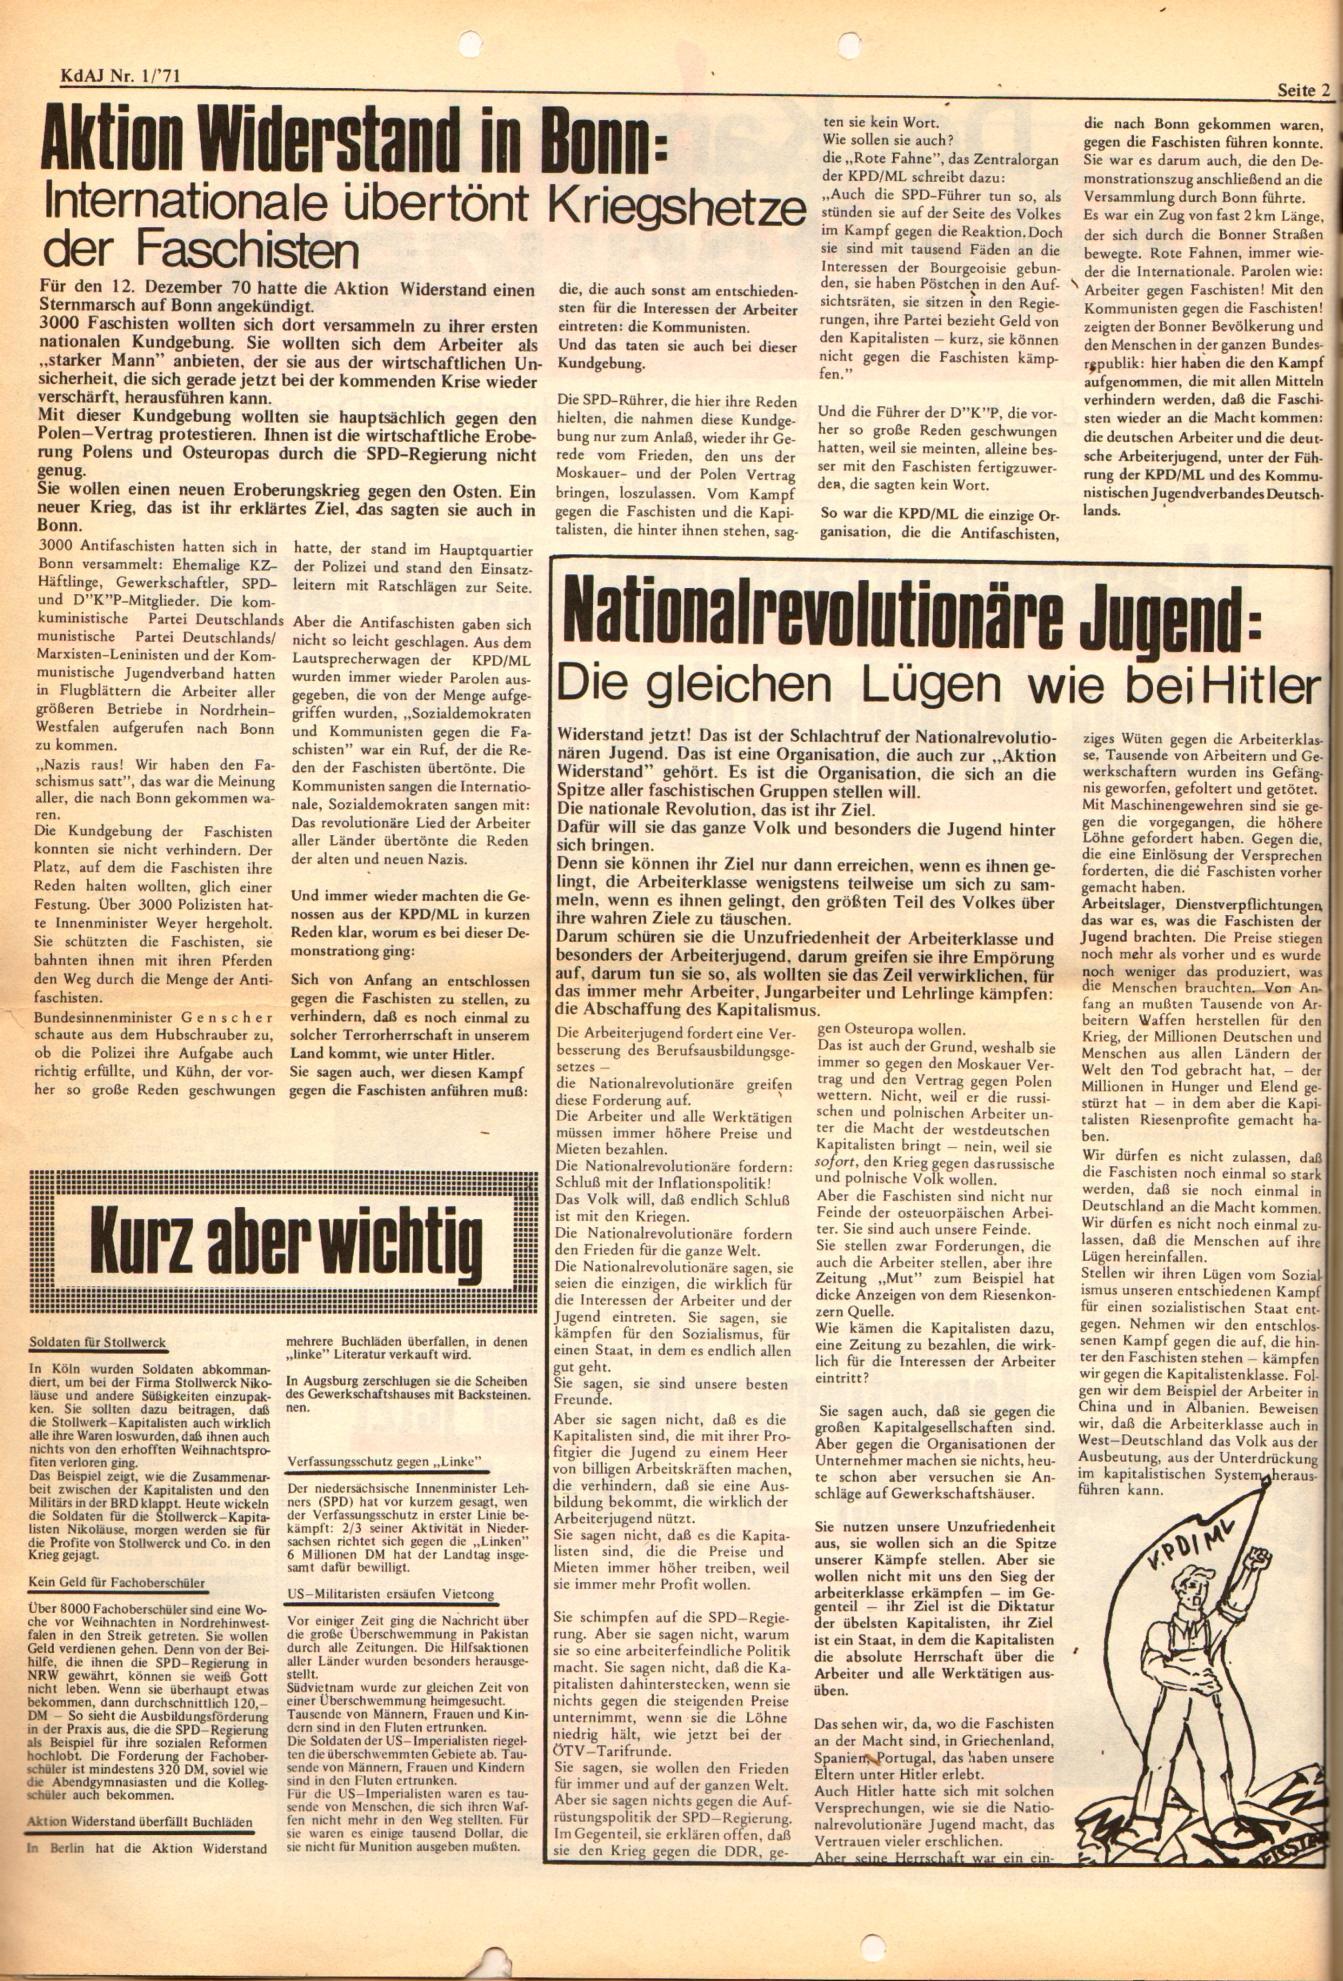 KDAJ, 2. Jg., Januar 1971, Nr. 1, Seite 2